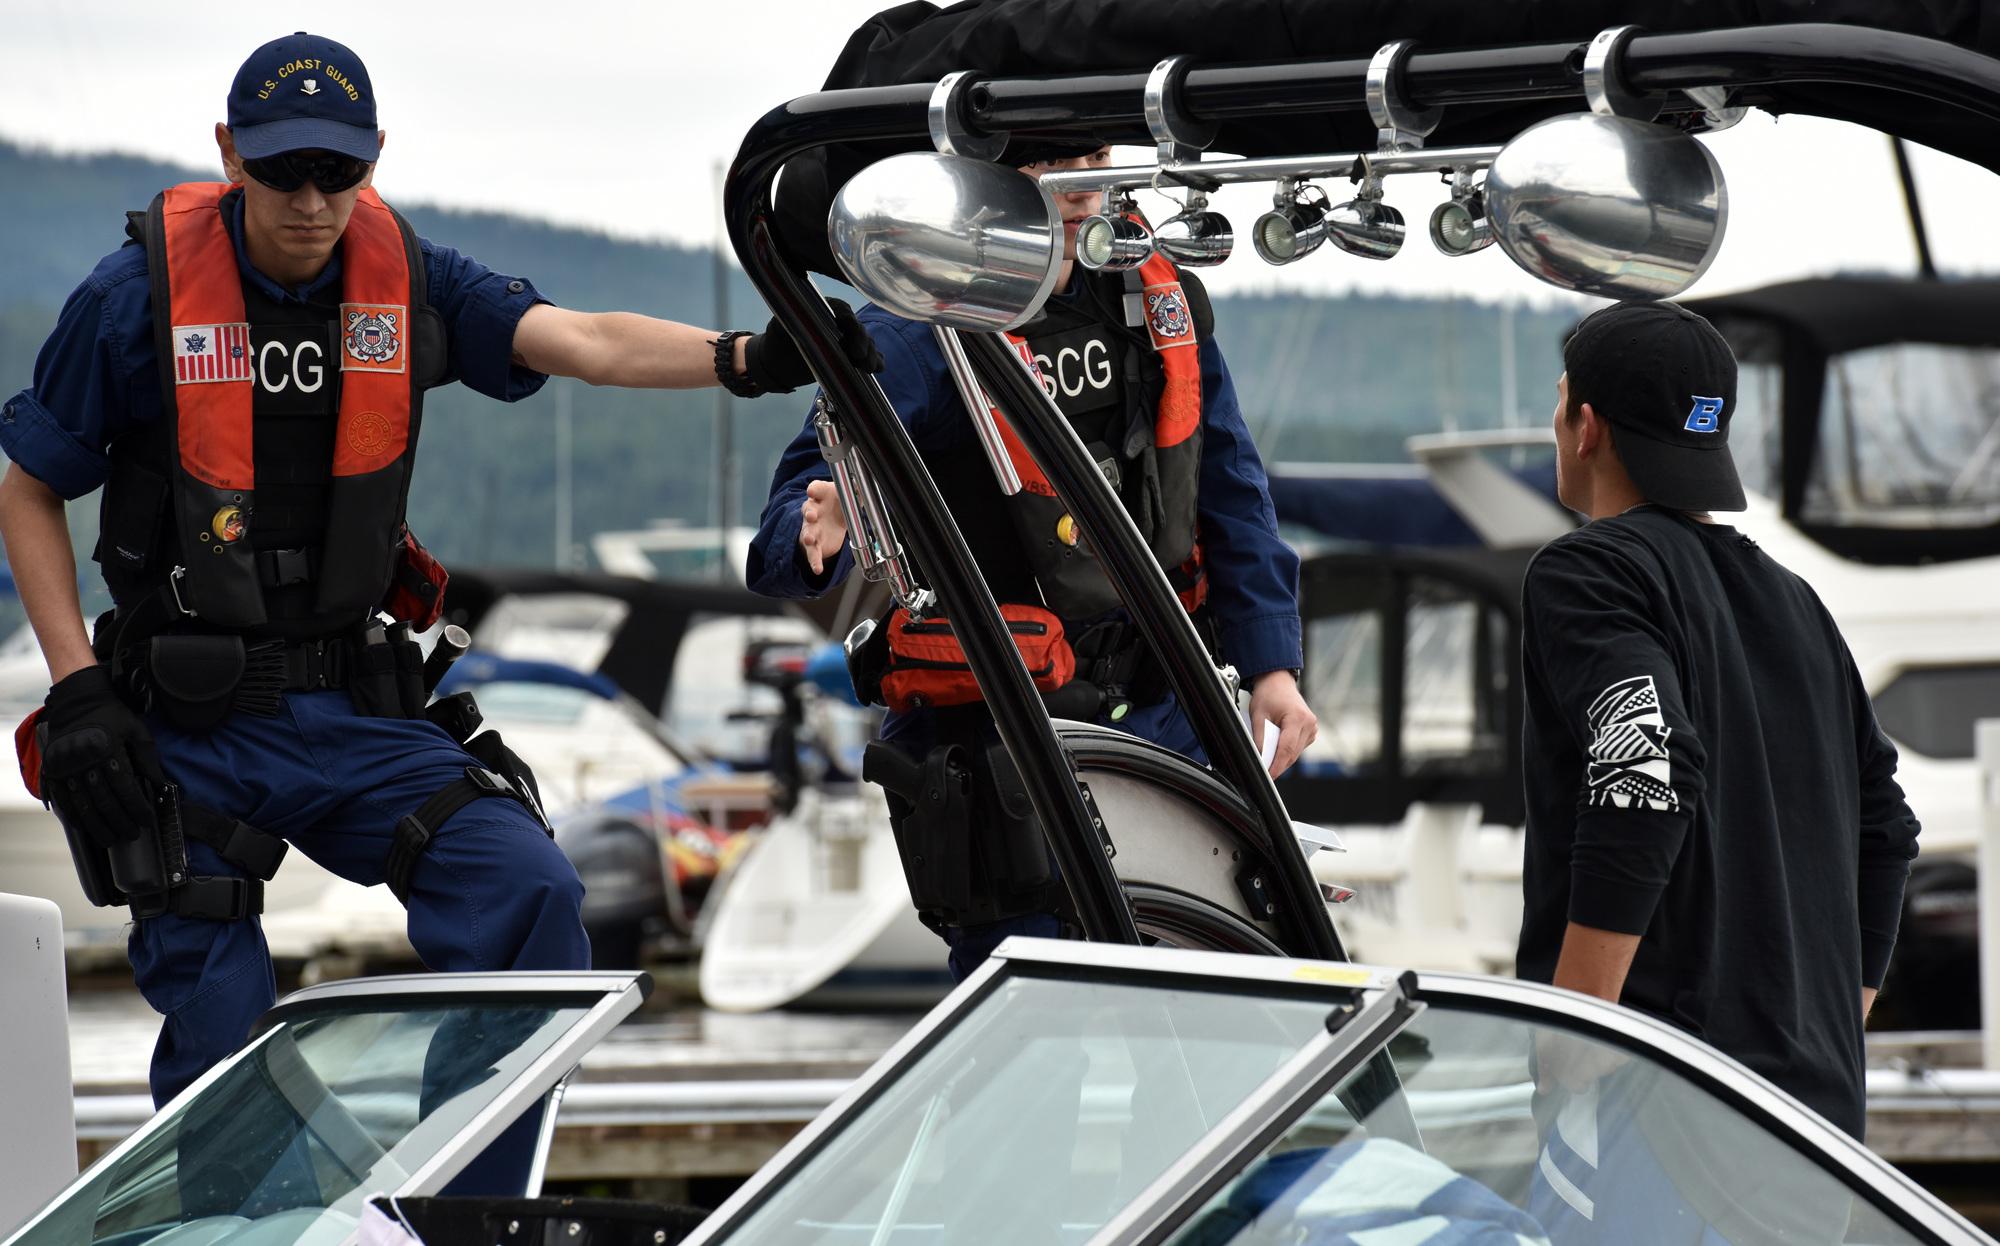 Coast Guard boat crews, Kootenai County Sheriff deputies monitor Lake Coeur d'Alene during 4th of July holiday [Image 4 of 26]